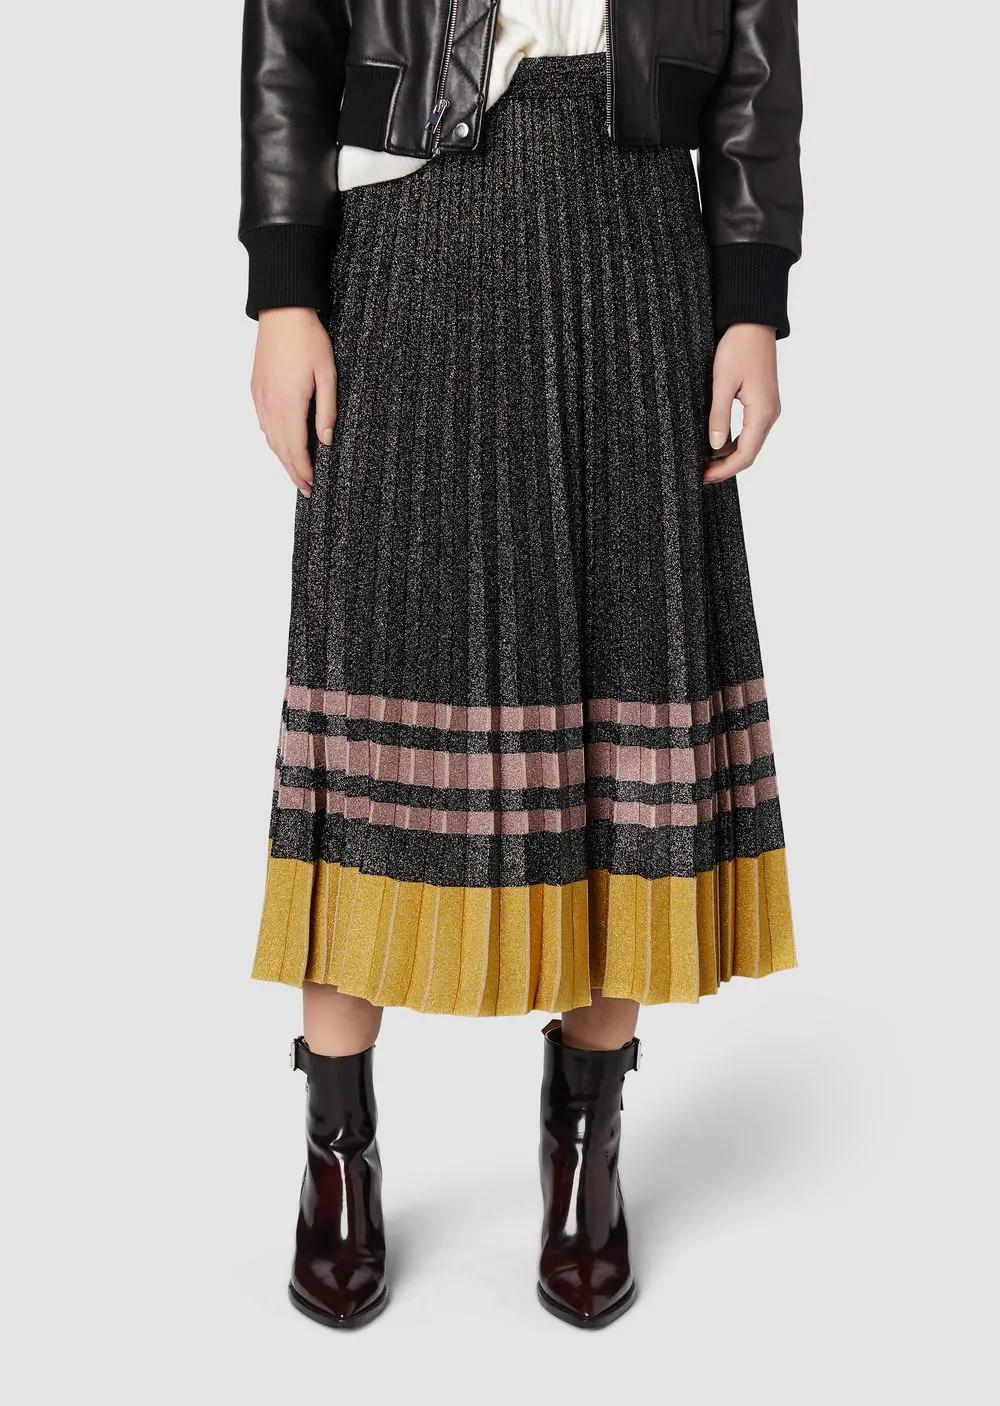 645bd2253f Derek Lam 10 Crosby Pleated Metallic Knit Midi Skirt In Black Multi ...